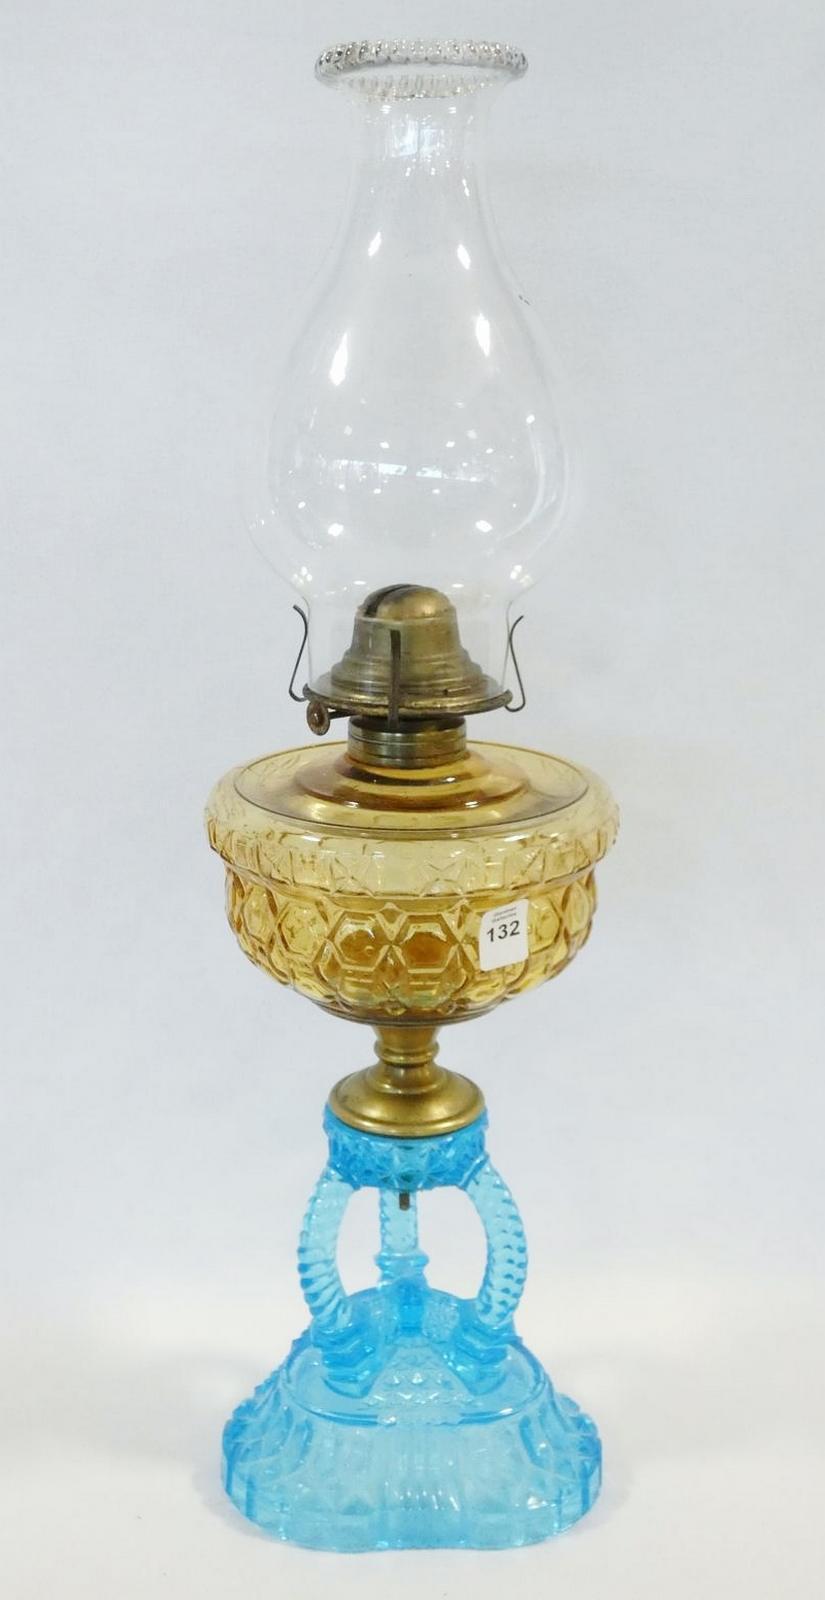 ANTIQUE COLOURED GLASS OIL LAMP